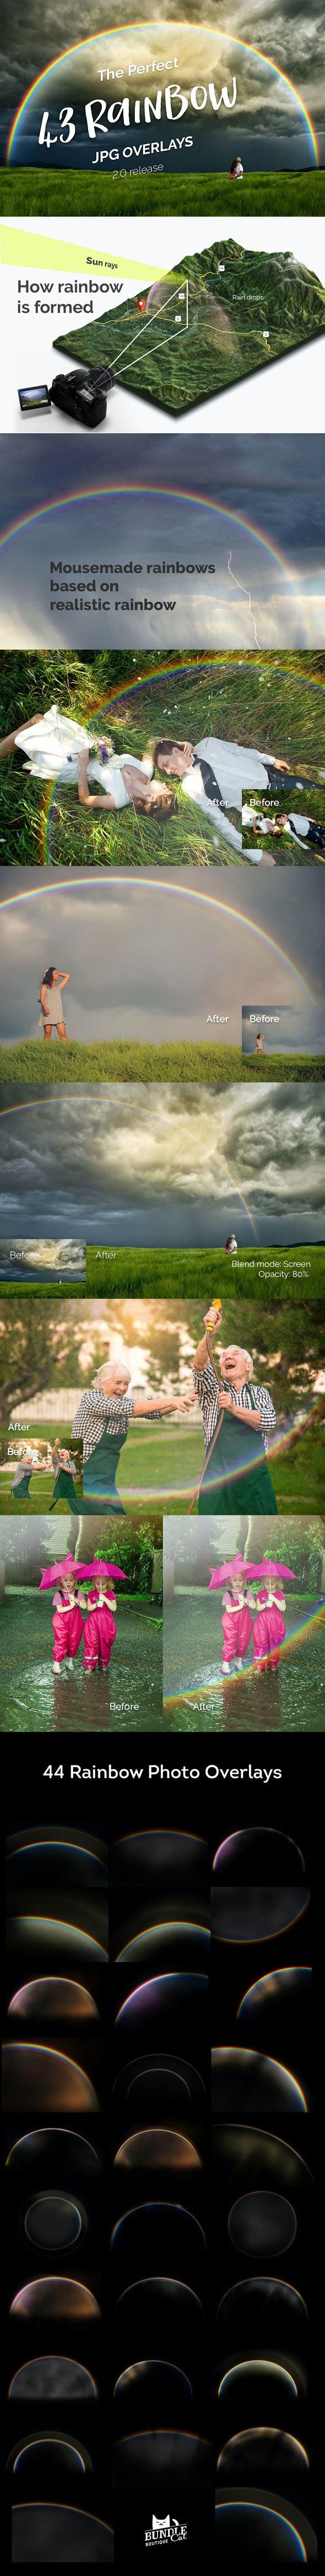 43 Rainbow Photo Overlays 2.0 - Photo Effects Actions